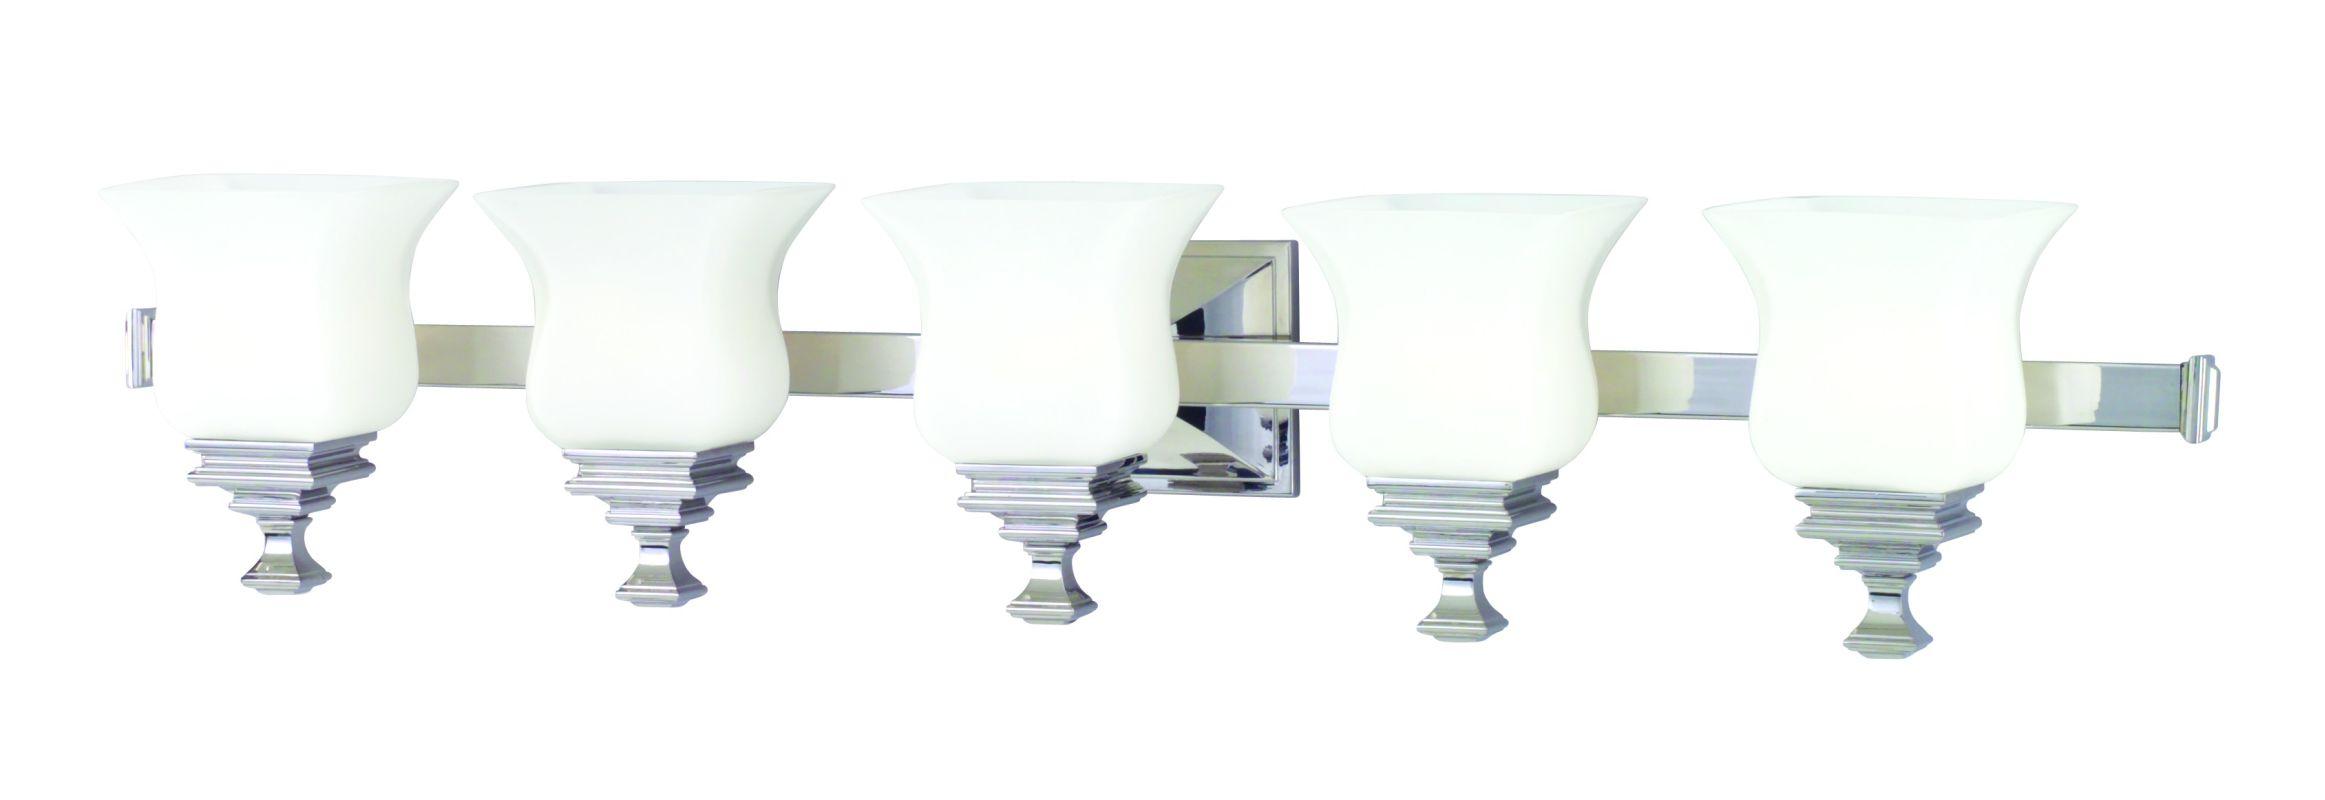 Vanity Lighting Facing Up Or Down : Hudson Valley Lighting 5505-SN Satin Nickel Wilton 5 Light Bathroom Vanity Fixture ...